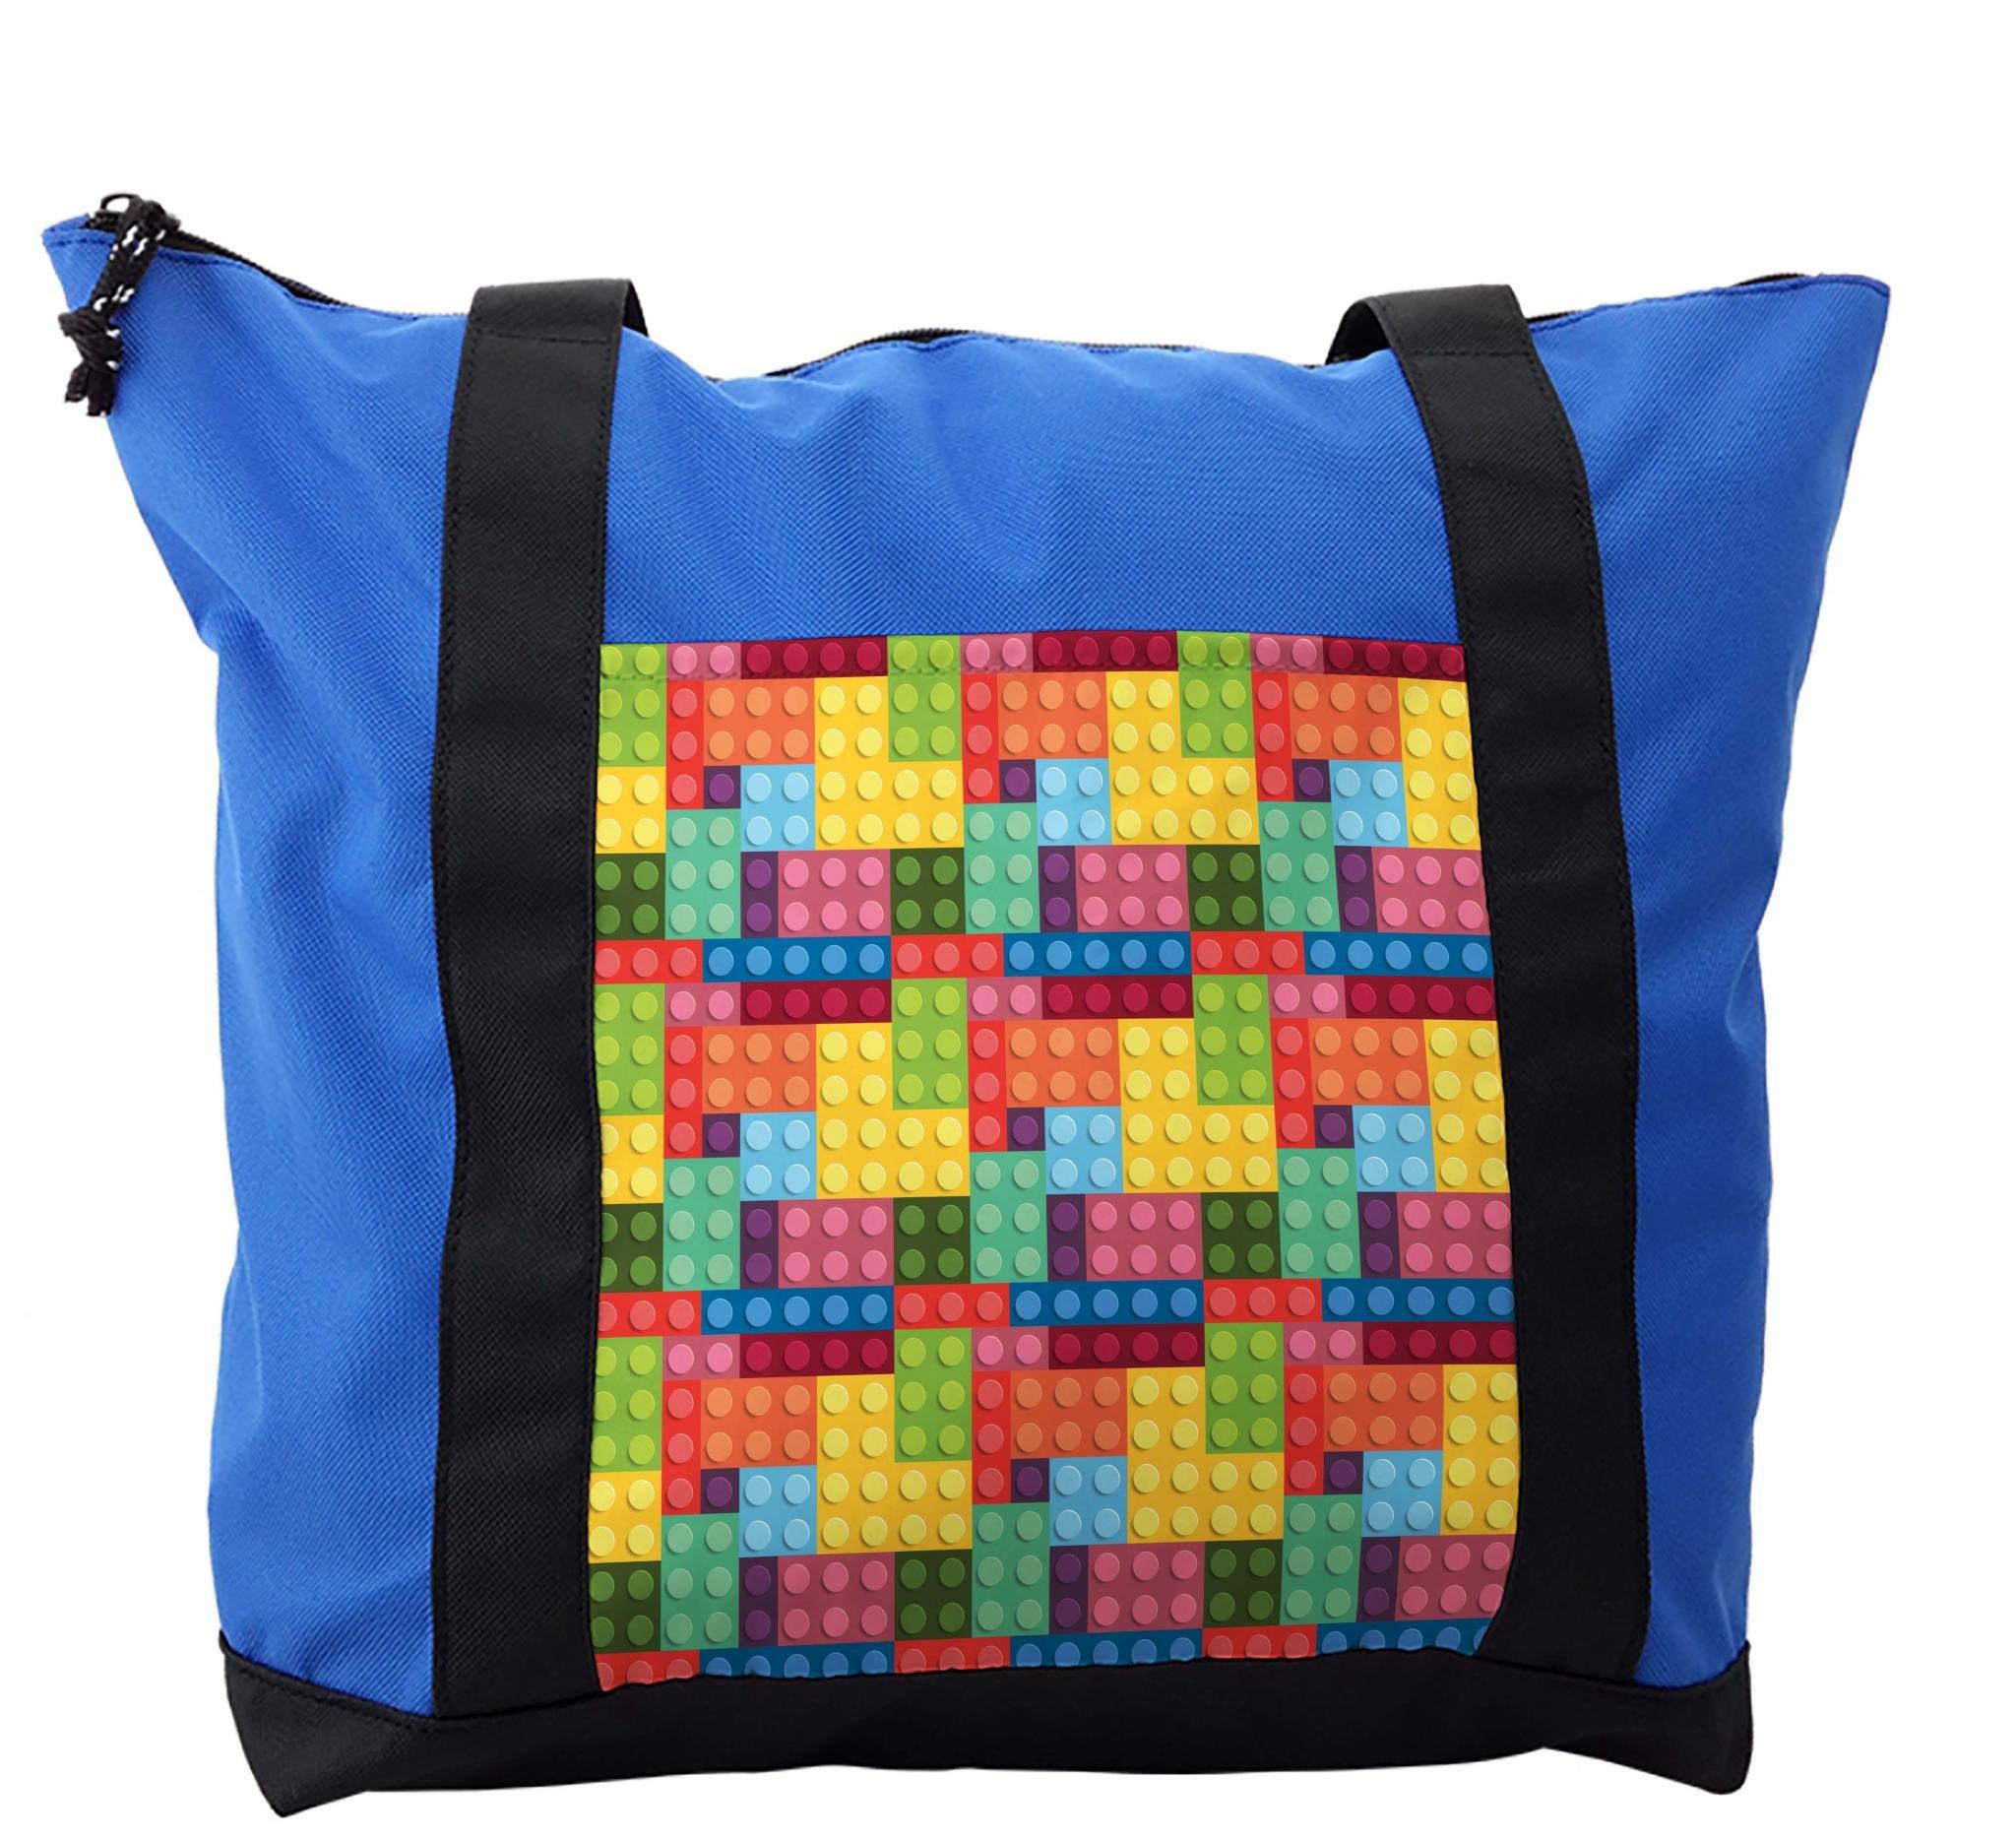 Lunarable Colorful Shoulder Bag, Kids Building Toy Blocks, Durable with Zipper